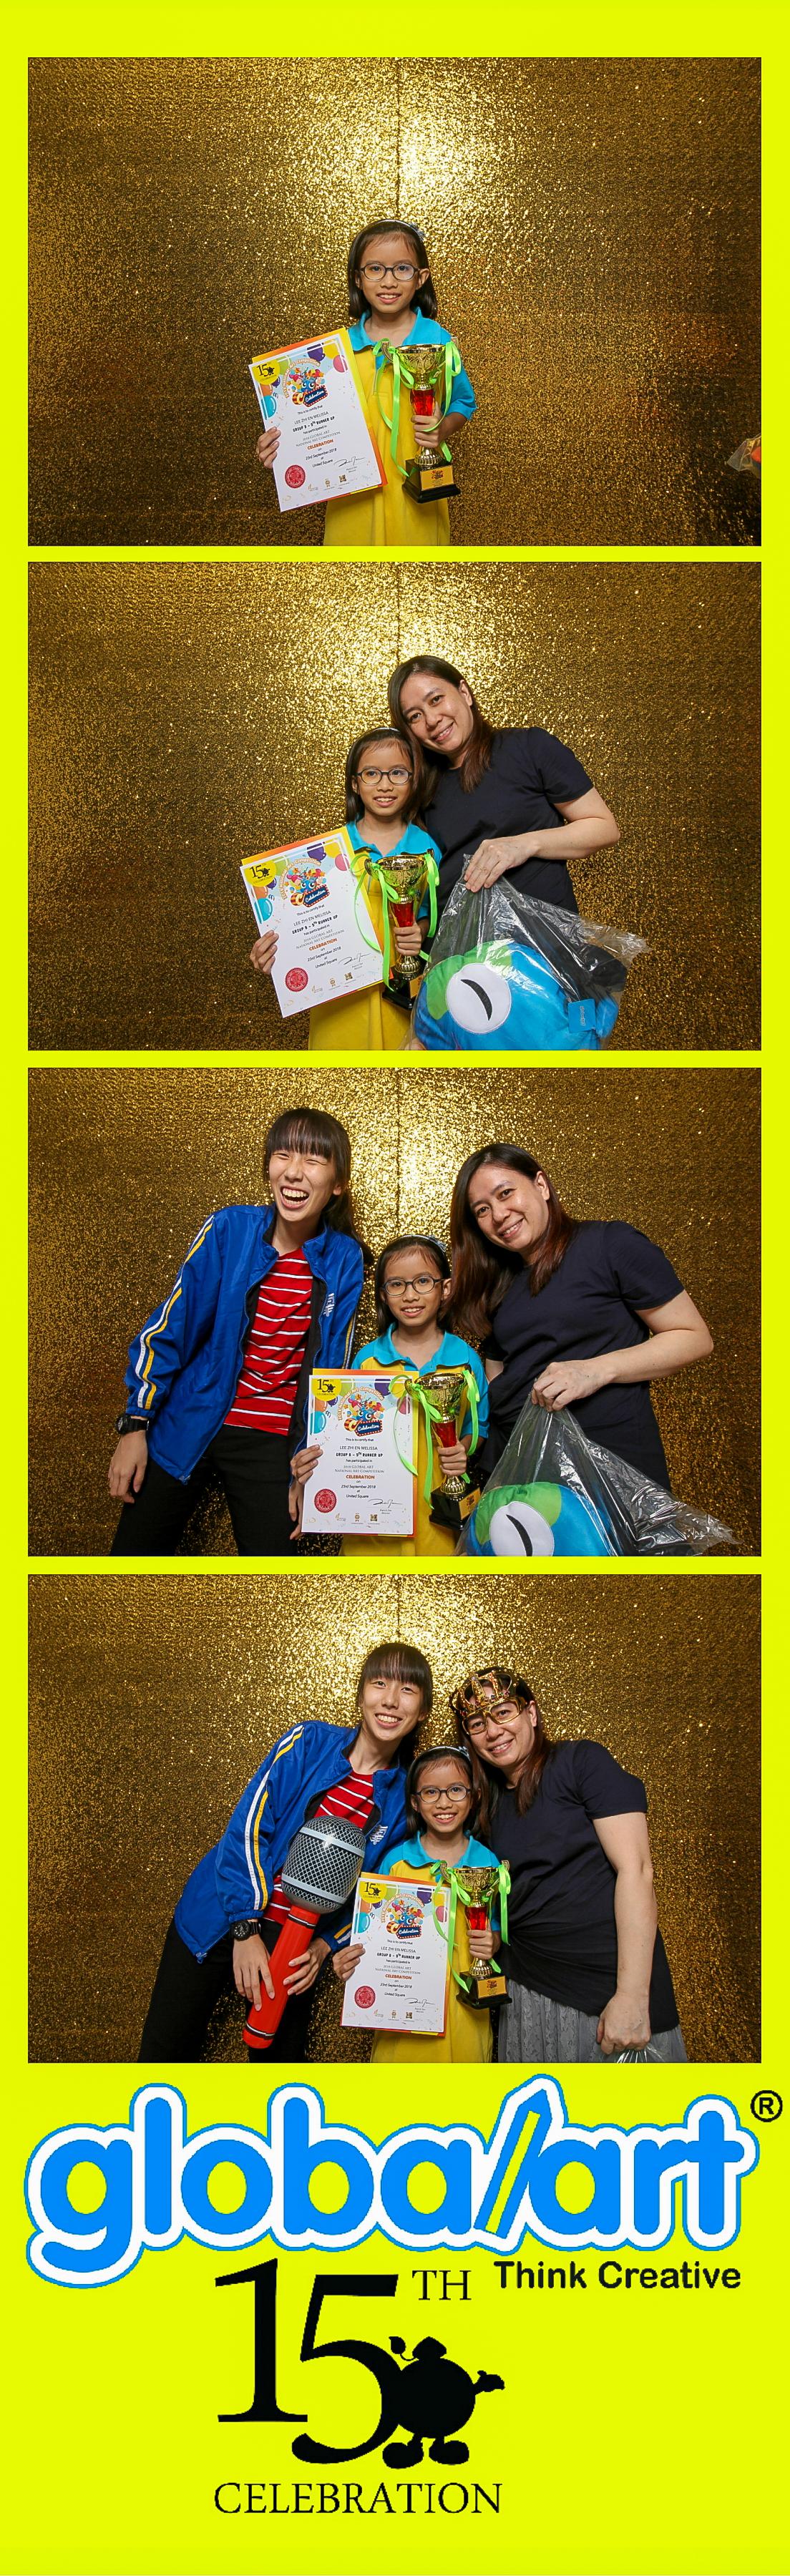 global art photo booth singapore (32)